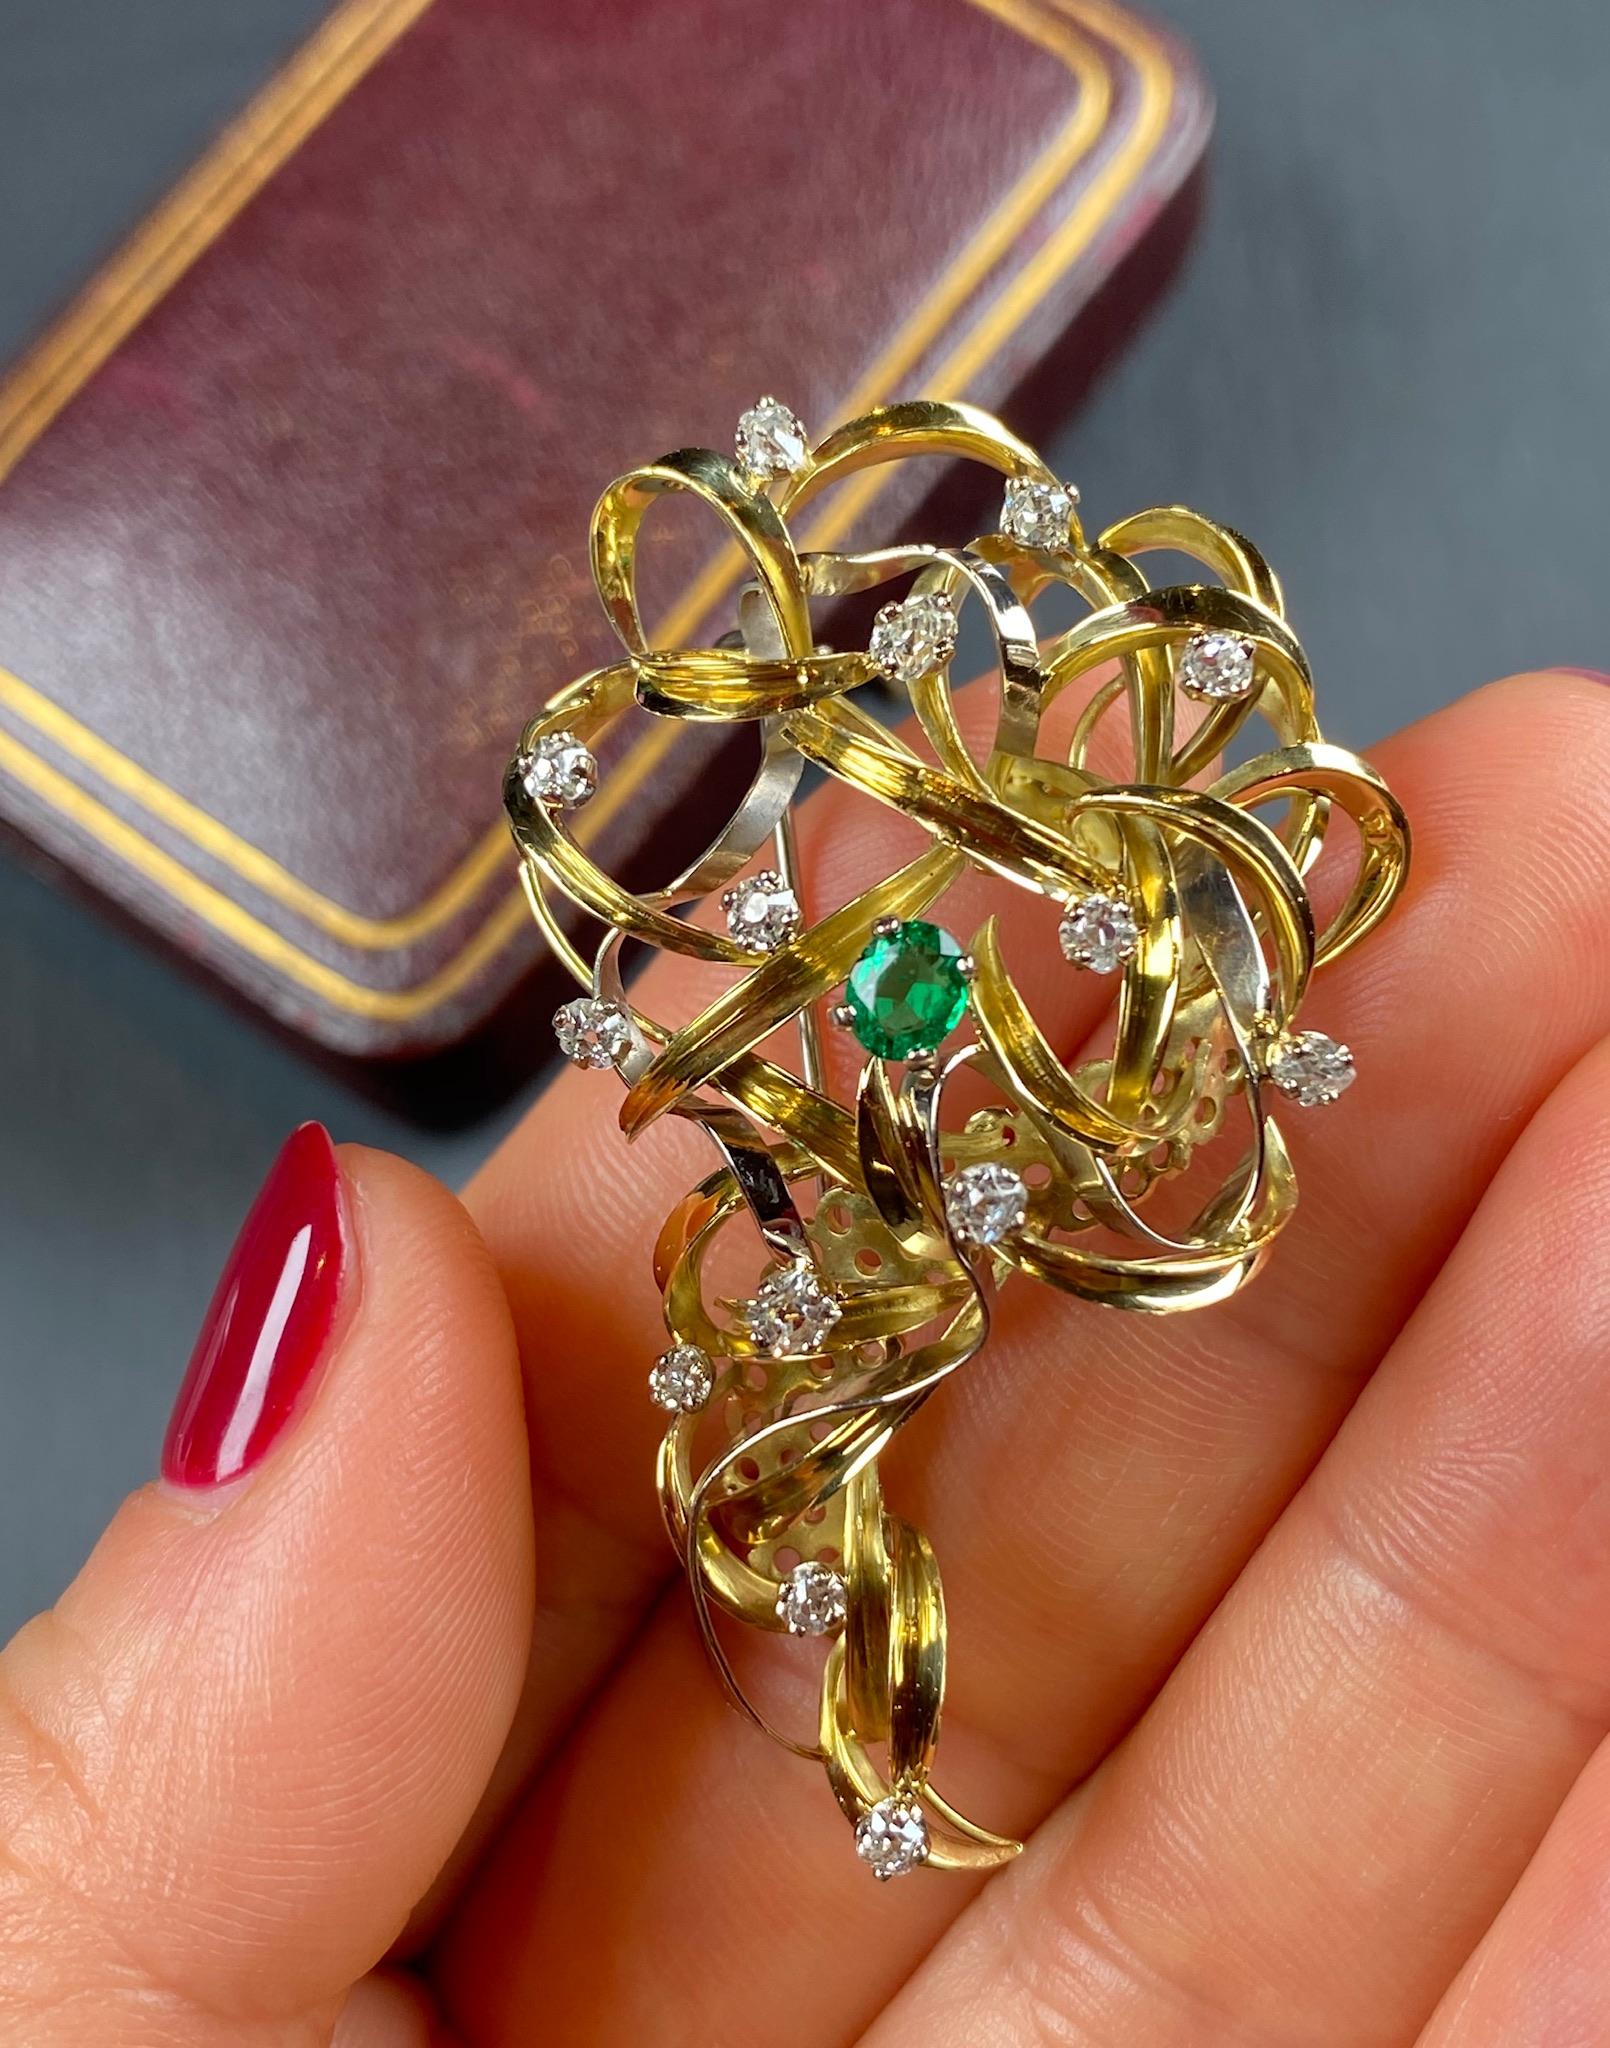 Lot 8 - Emerald and Diamond Brooch